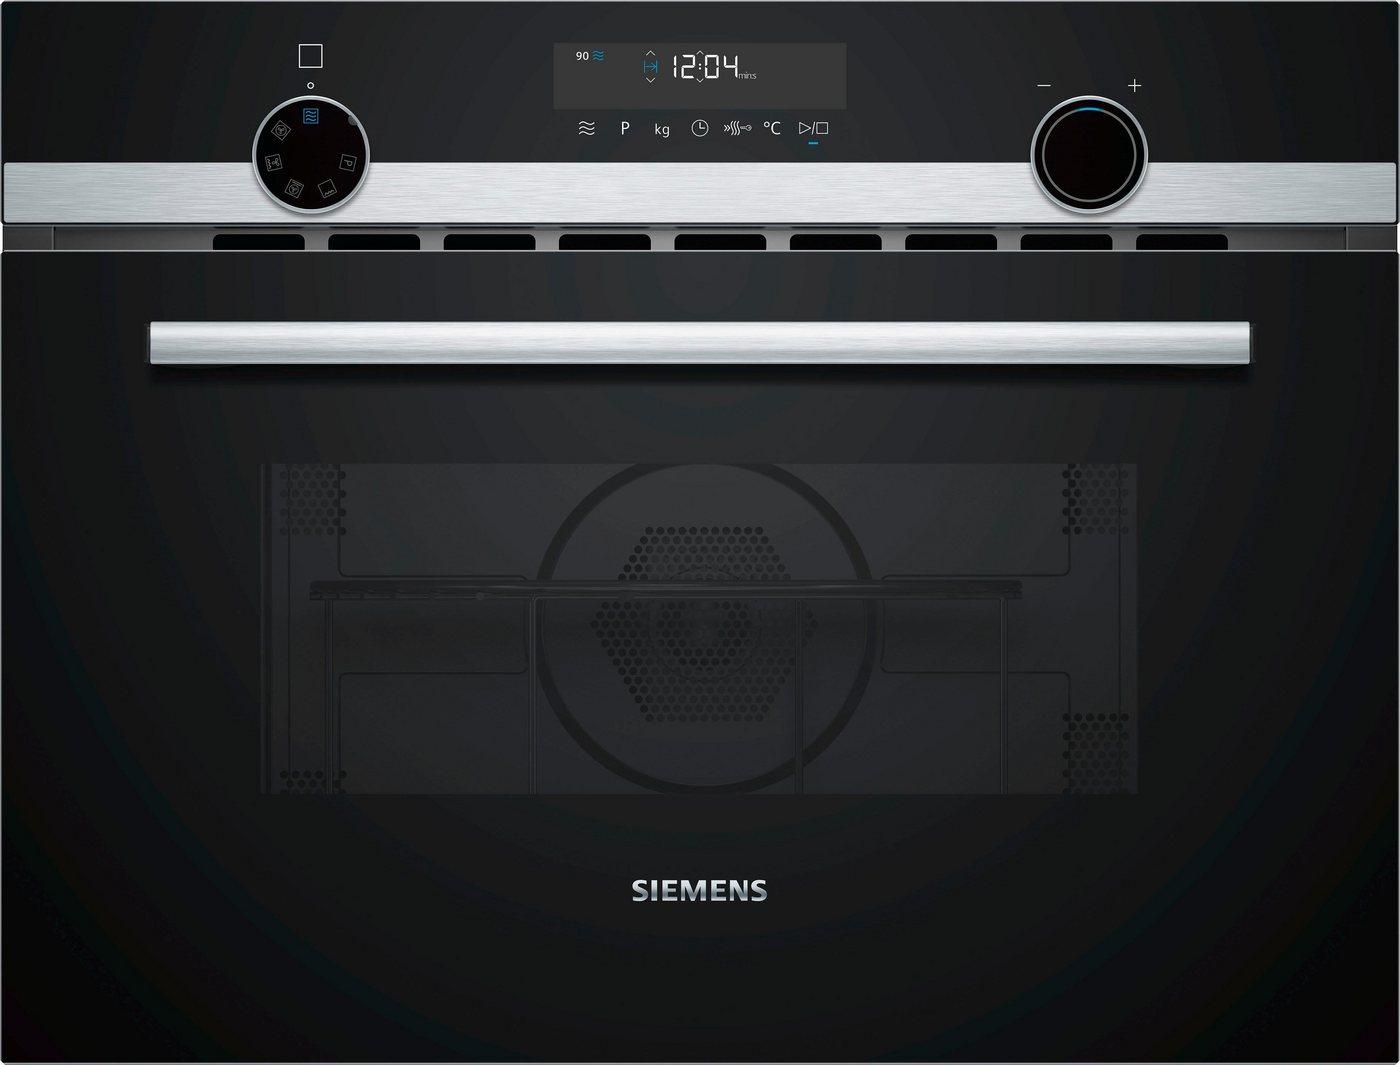 Siemens Kompaktbackofen mit Mikrowelle CM585AMS0 - Preisvergleich